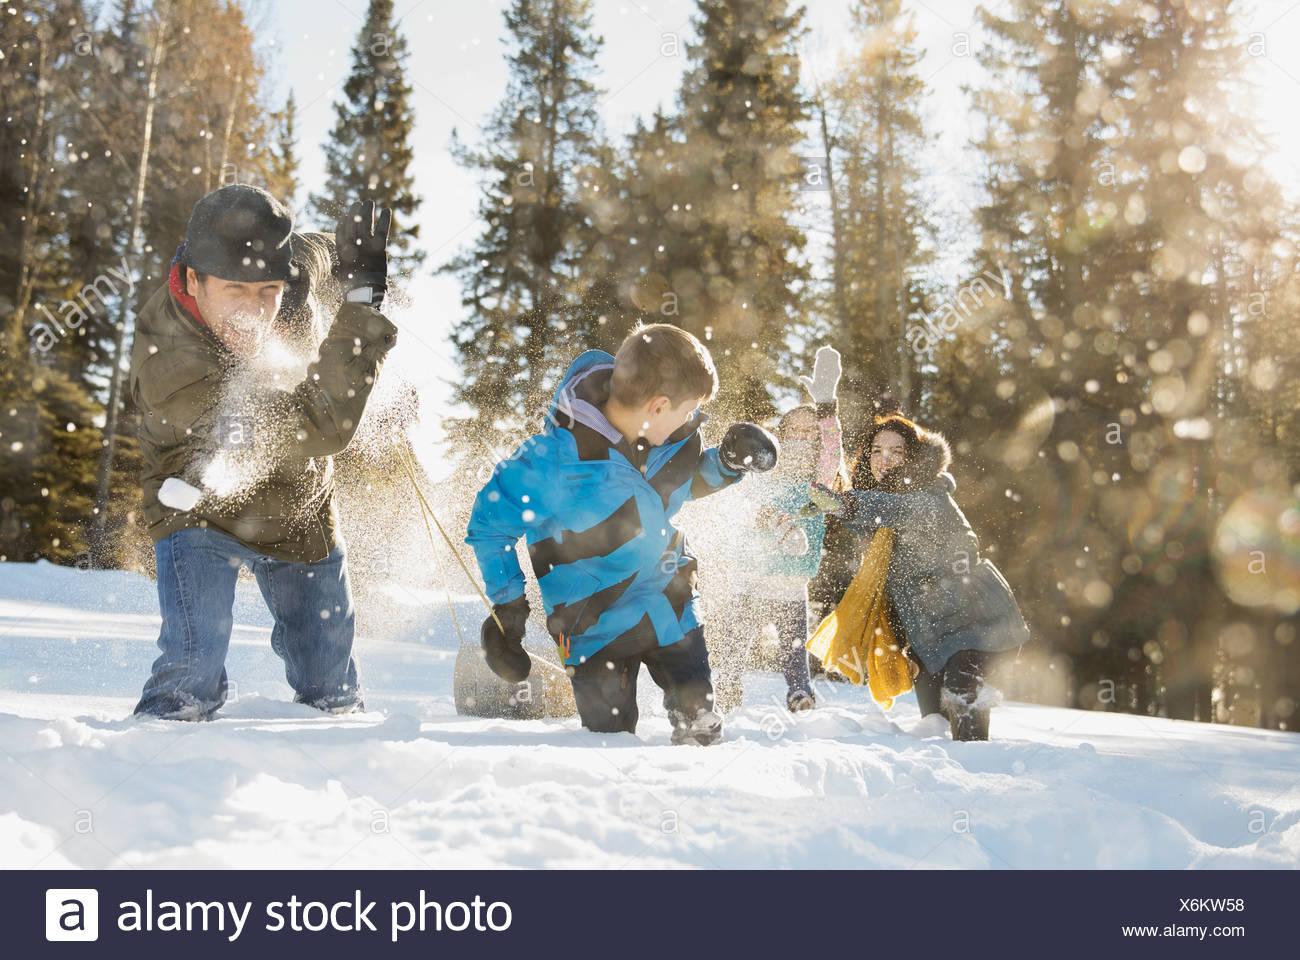 Familia Lucha de bola de nieve en el exterior Imagen De Stock